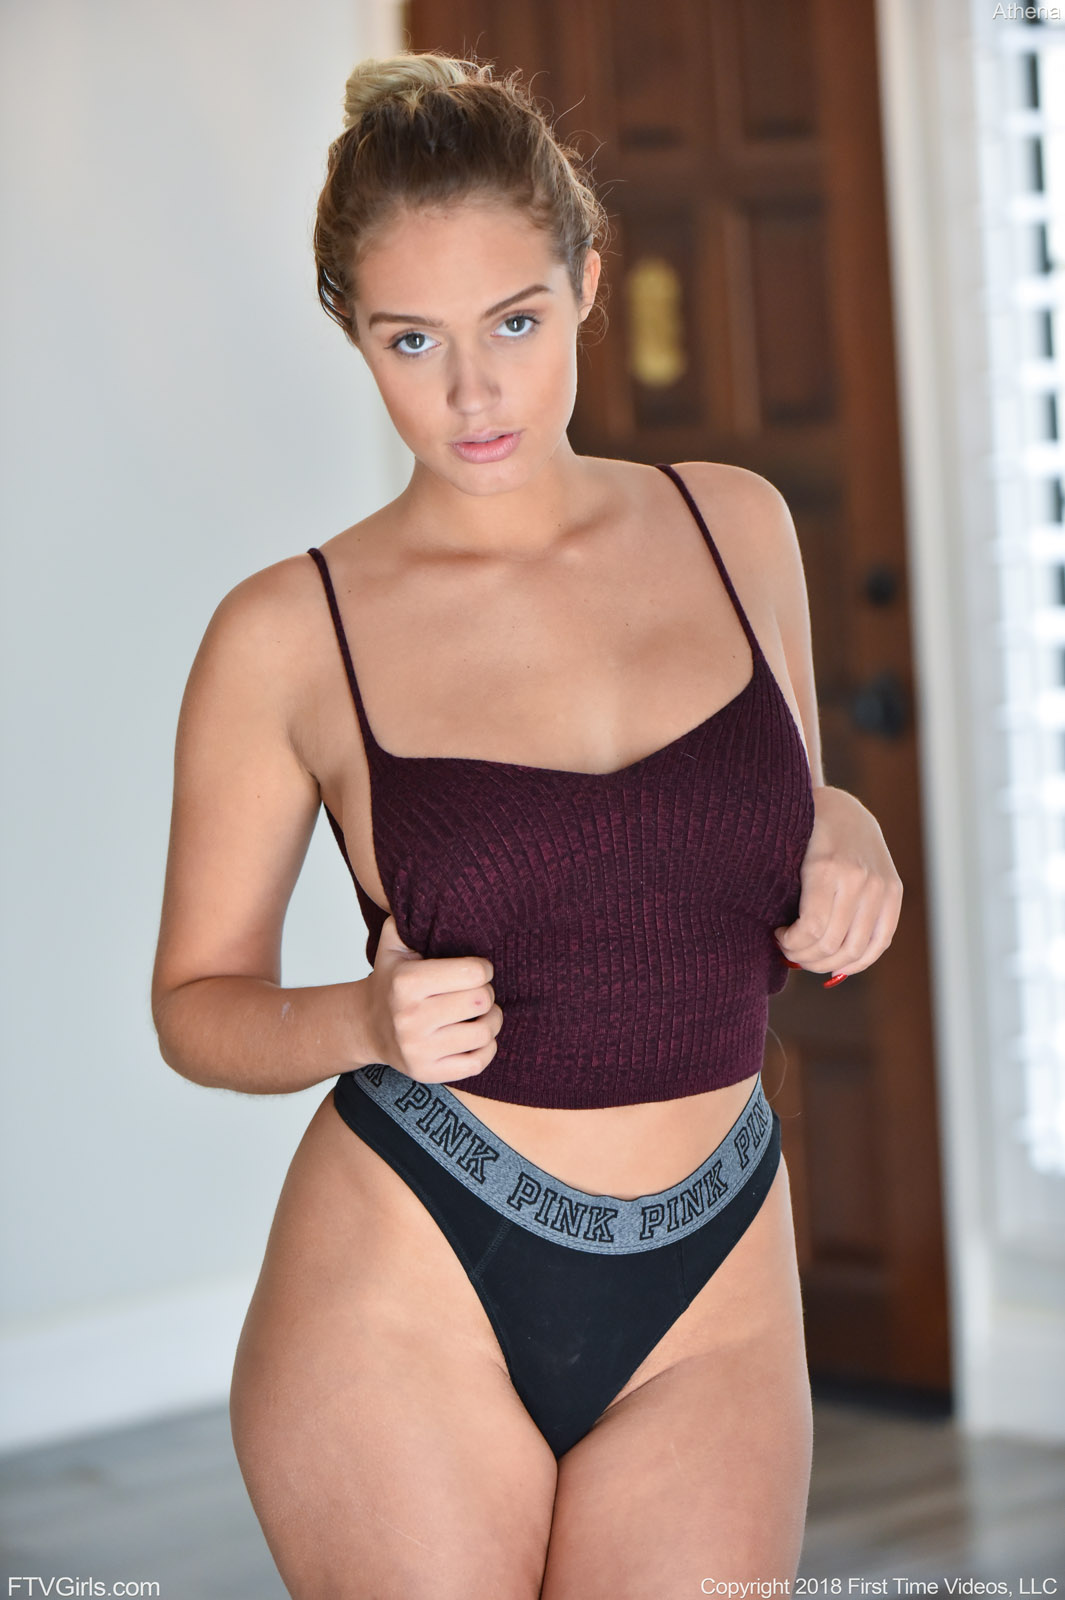 Teen hot butt nude ig